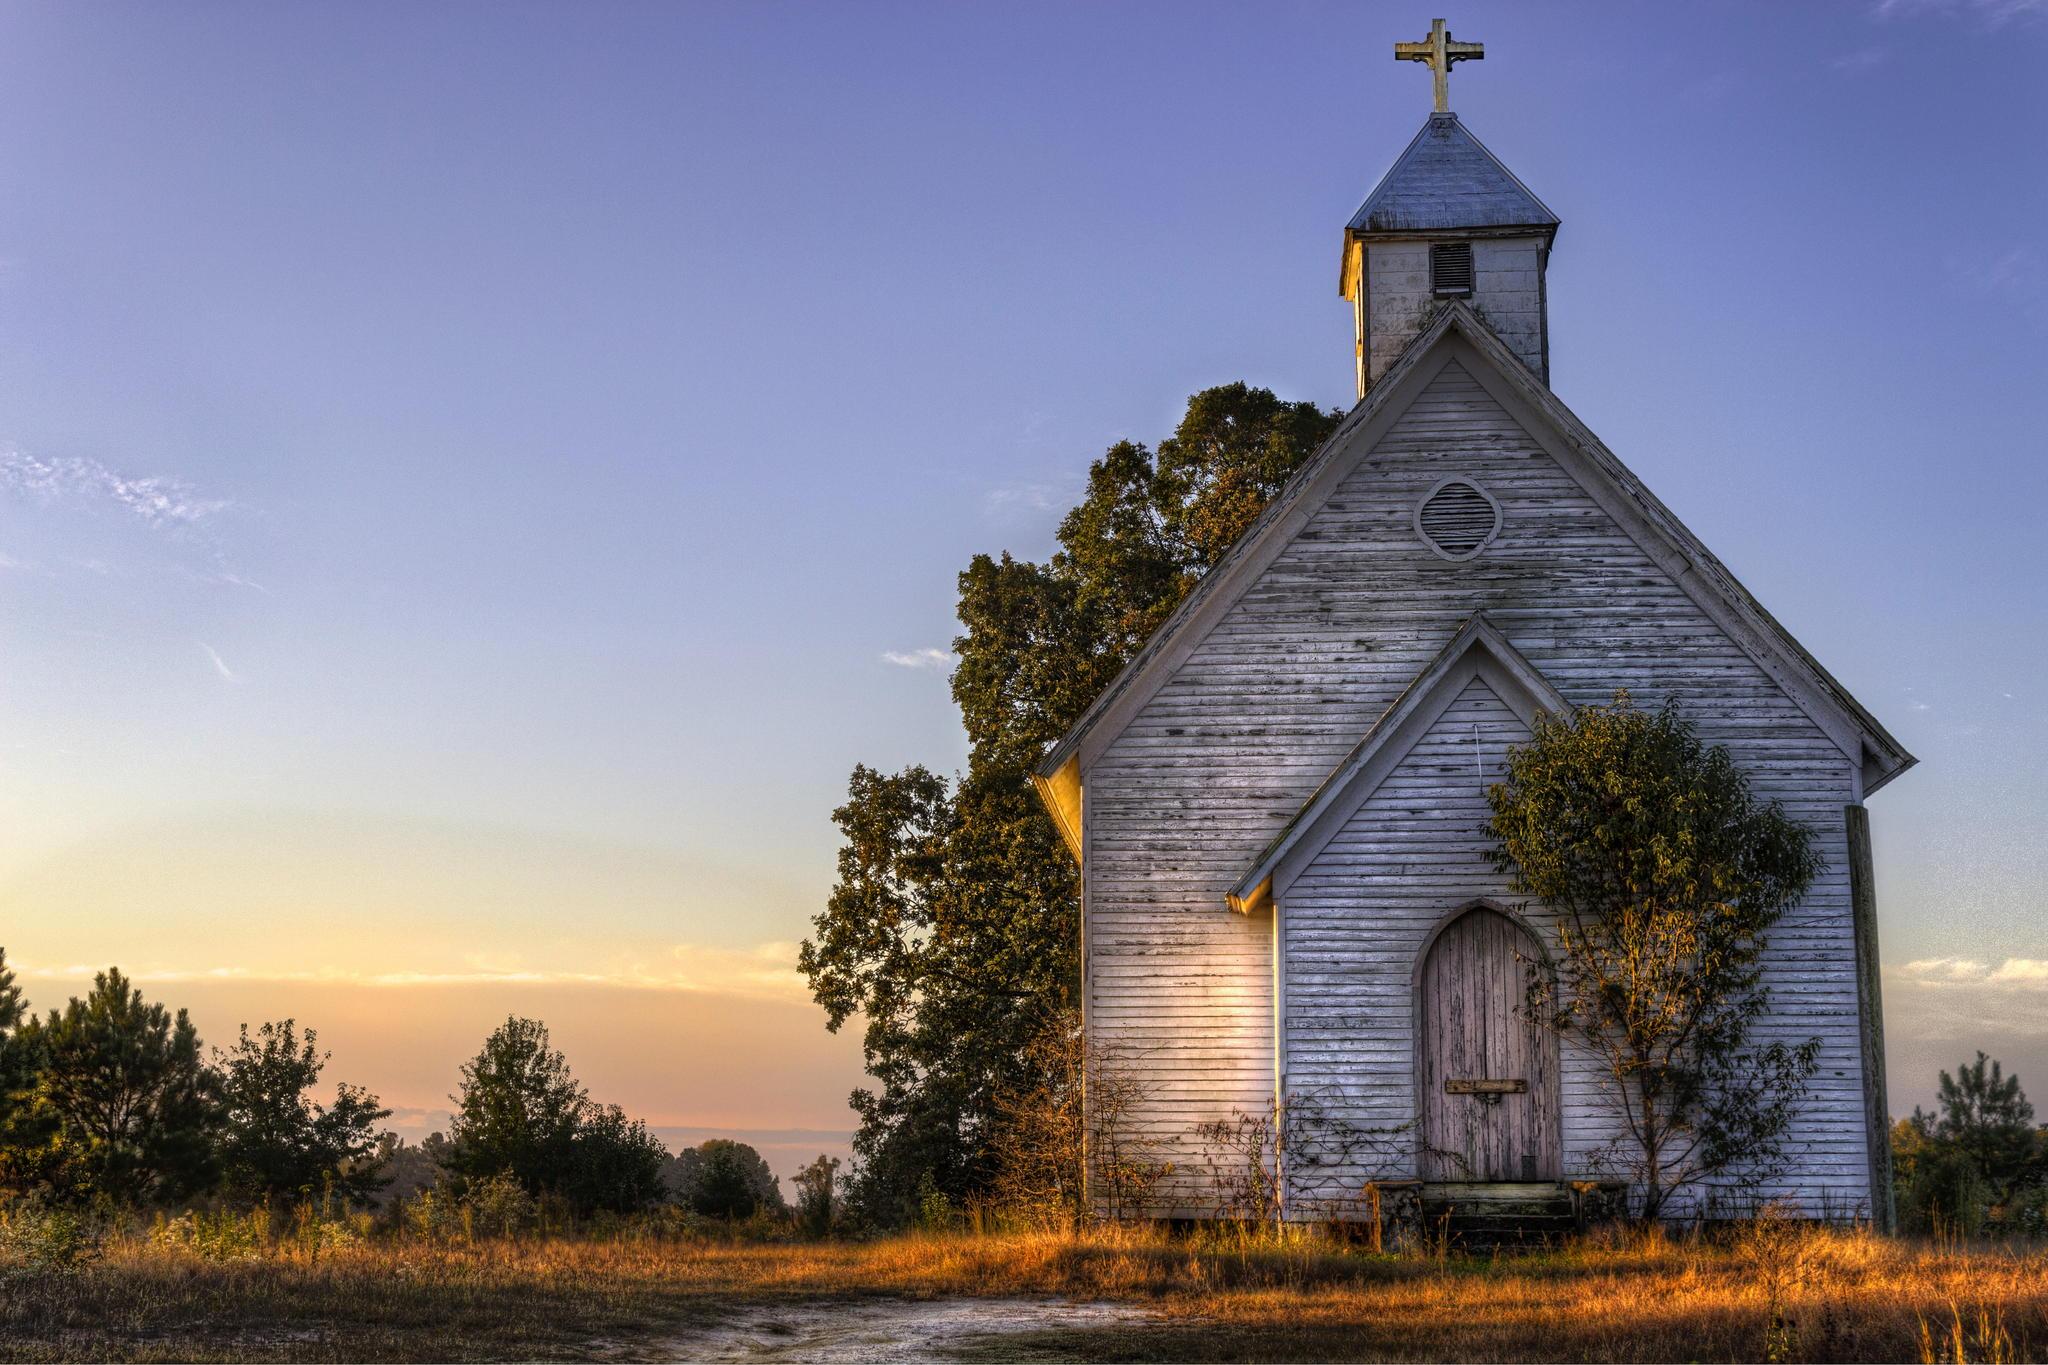 country church 3.jpg